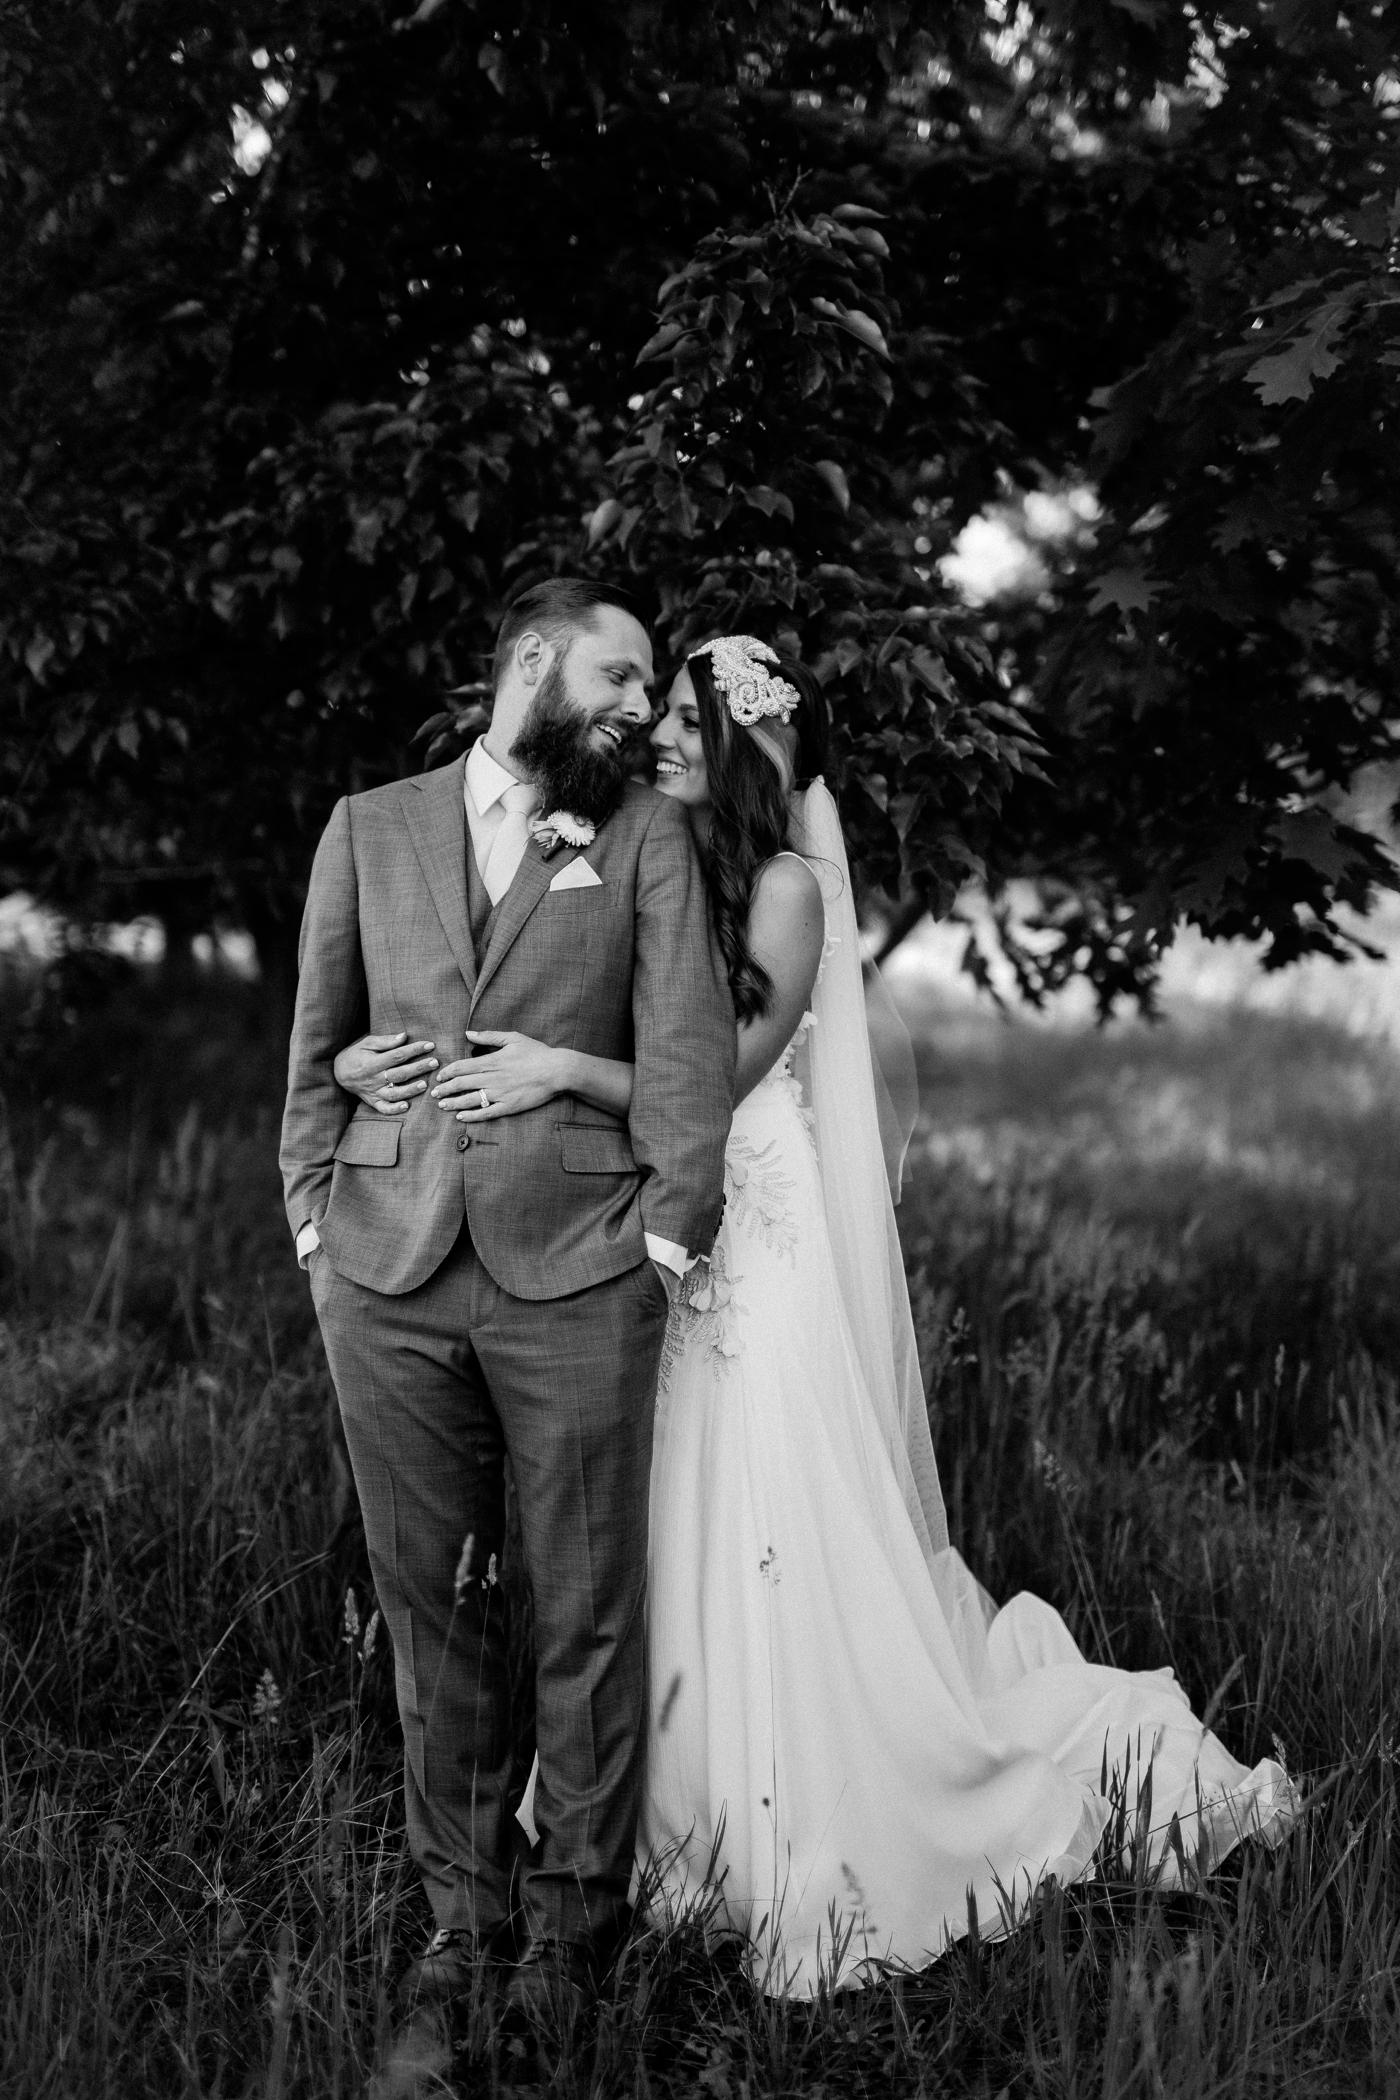 Maddy & Wes - K1 by Geoff Hardy Wedding - Adelaide Wedding Photographer - Natural wedding photography in Adelaide - Katherine Schultz_0045.jpg